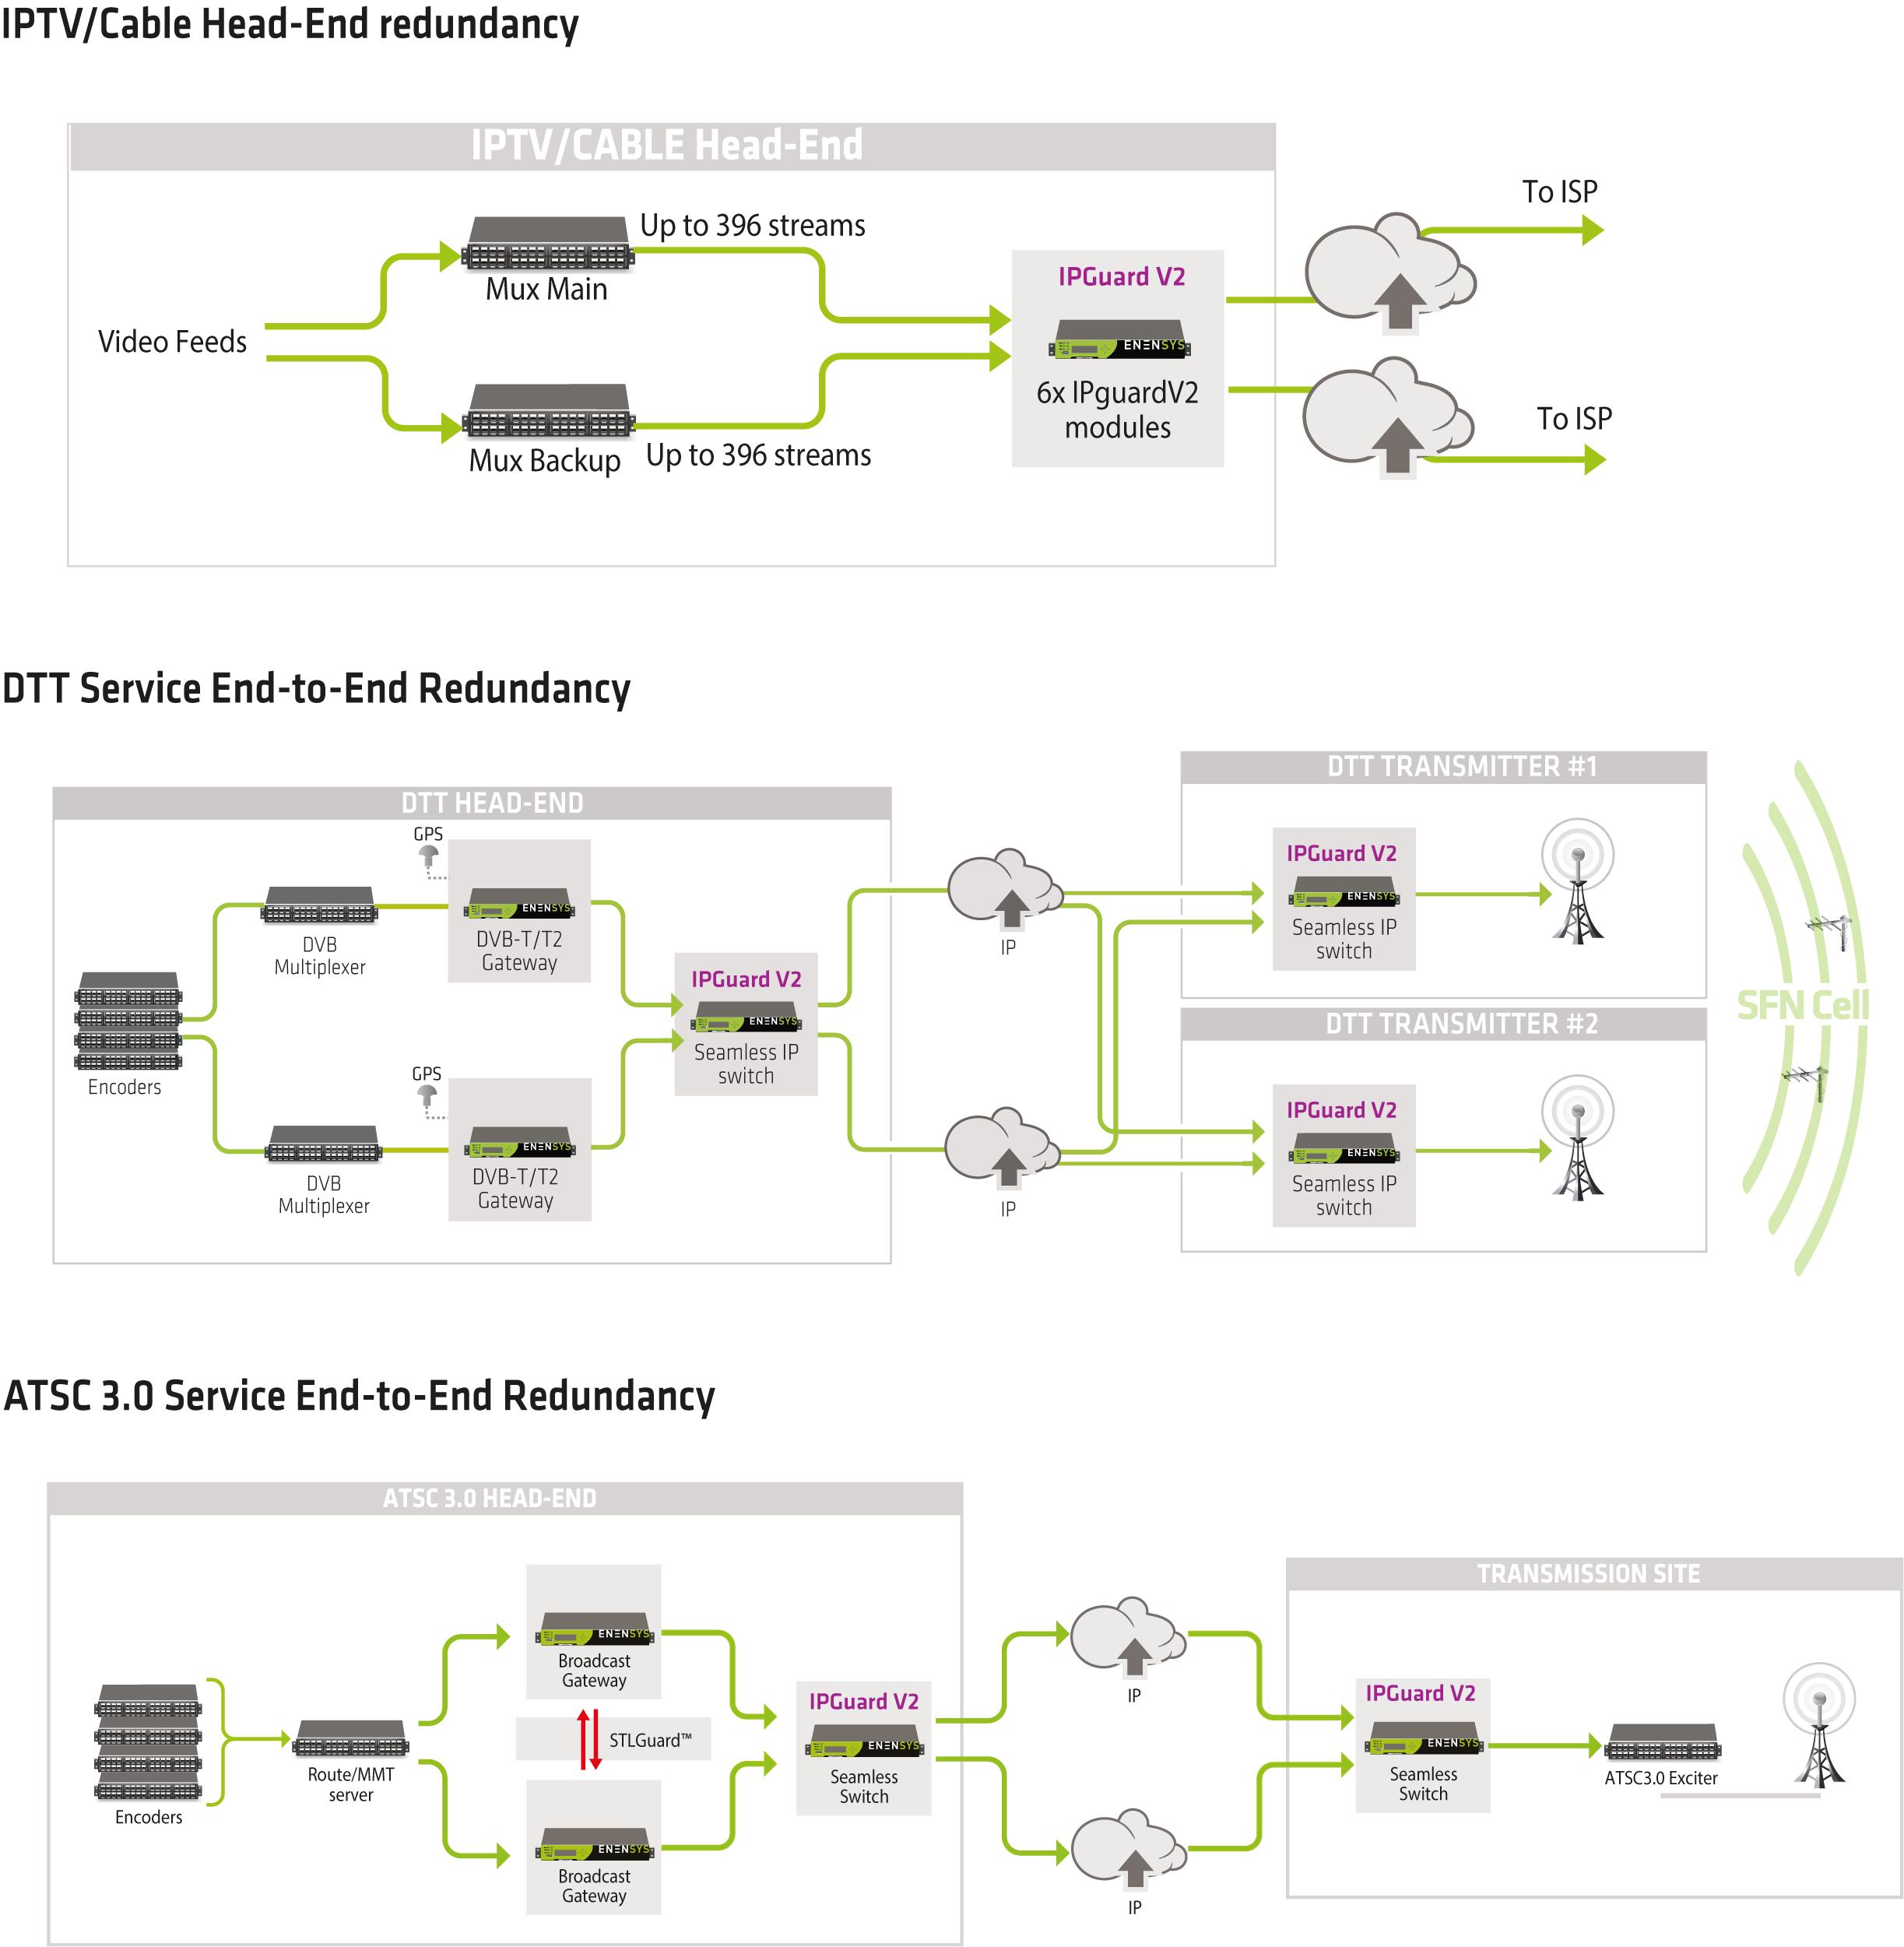 IPGuardV2 - 1+1 Automatic IP switching - ENENSYS